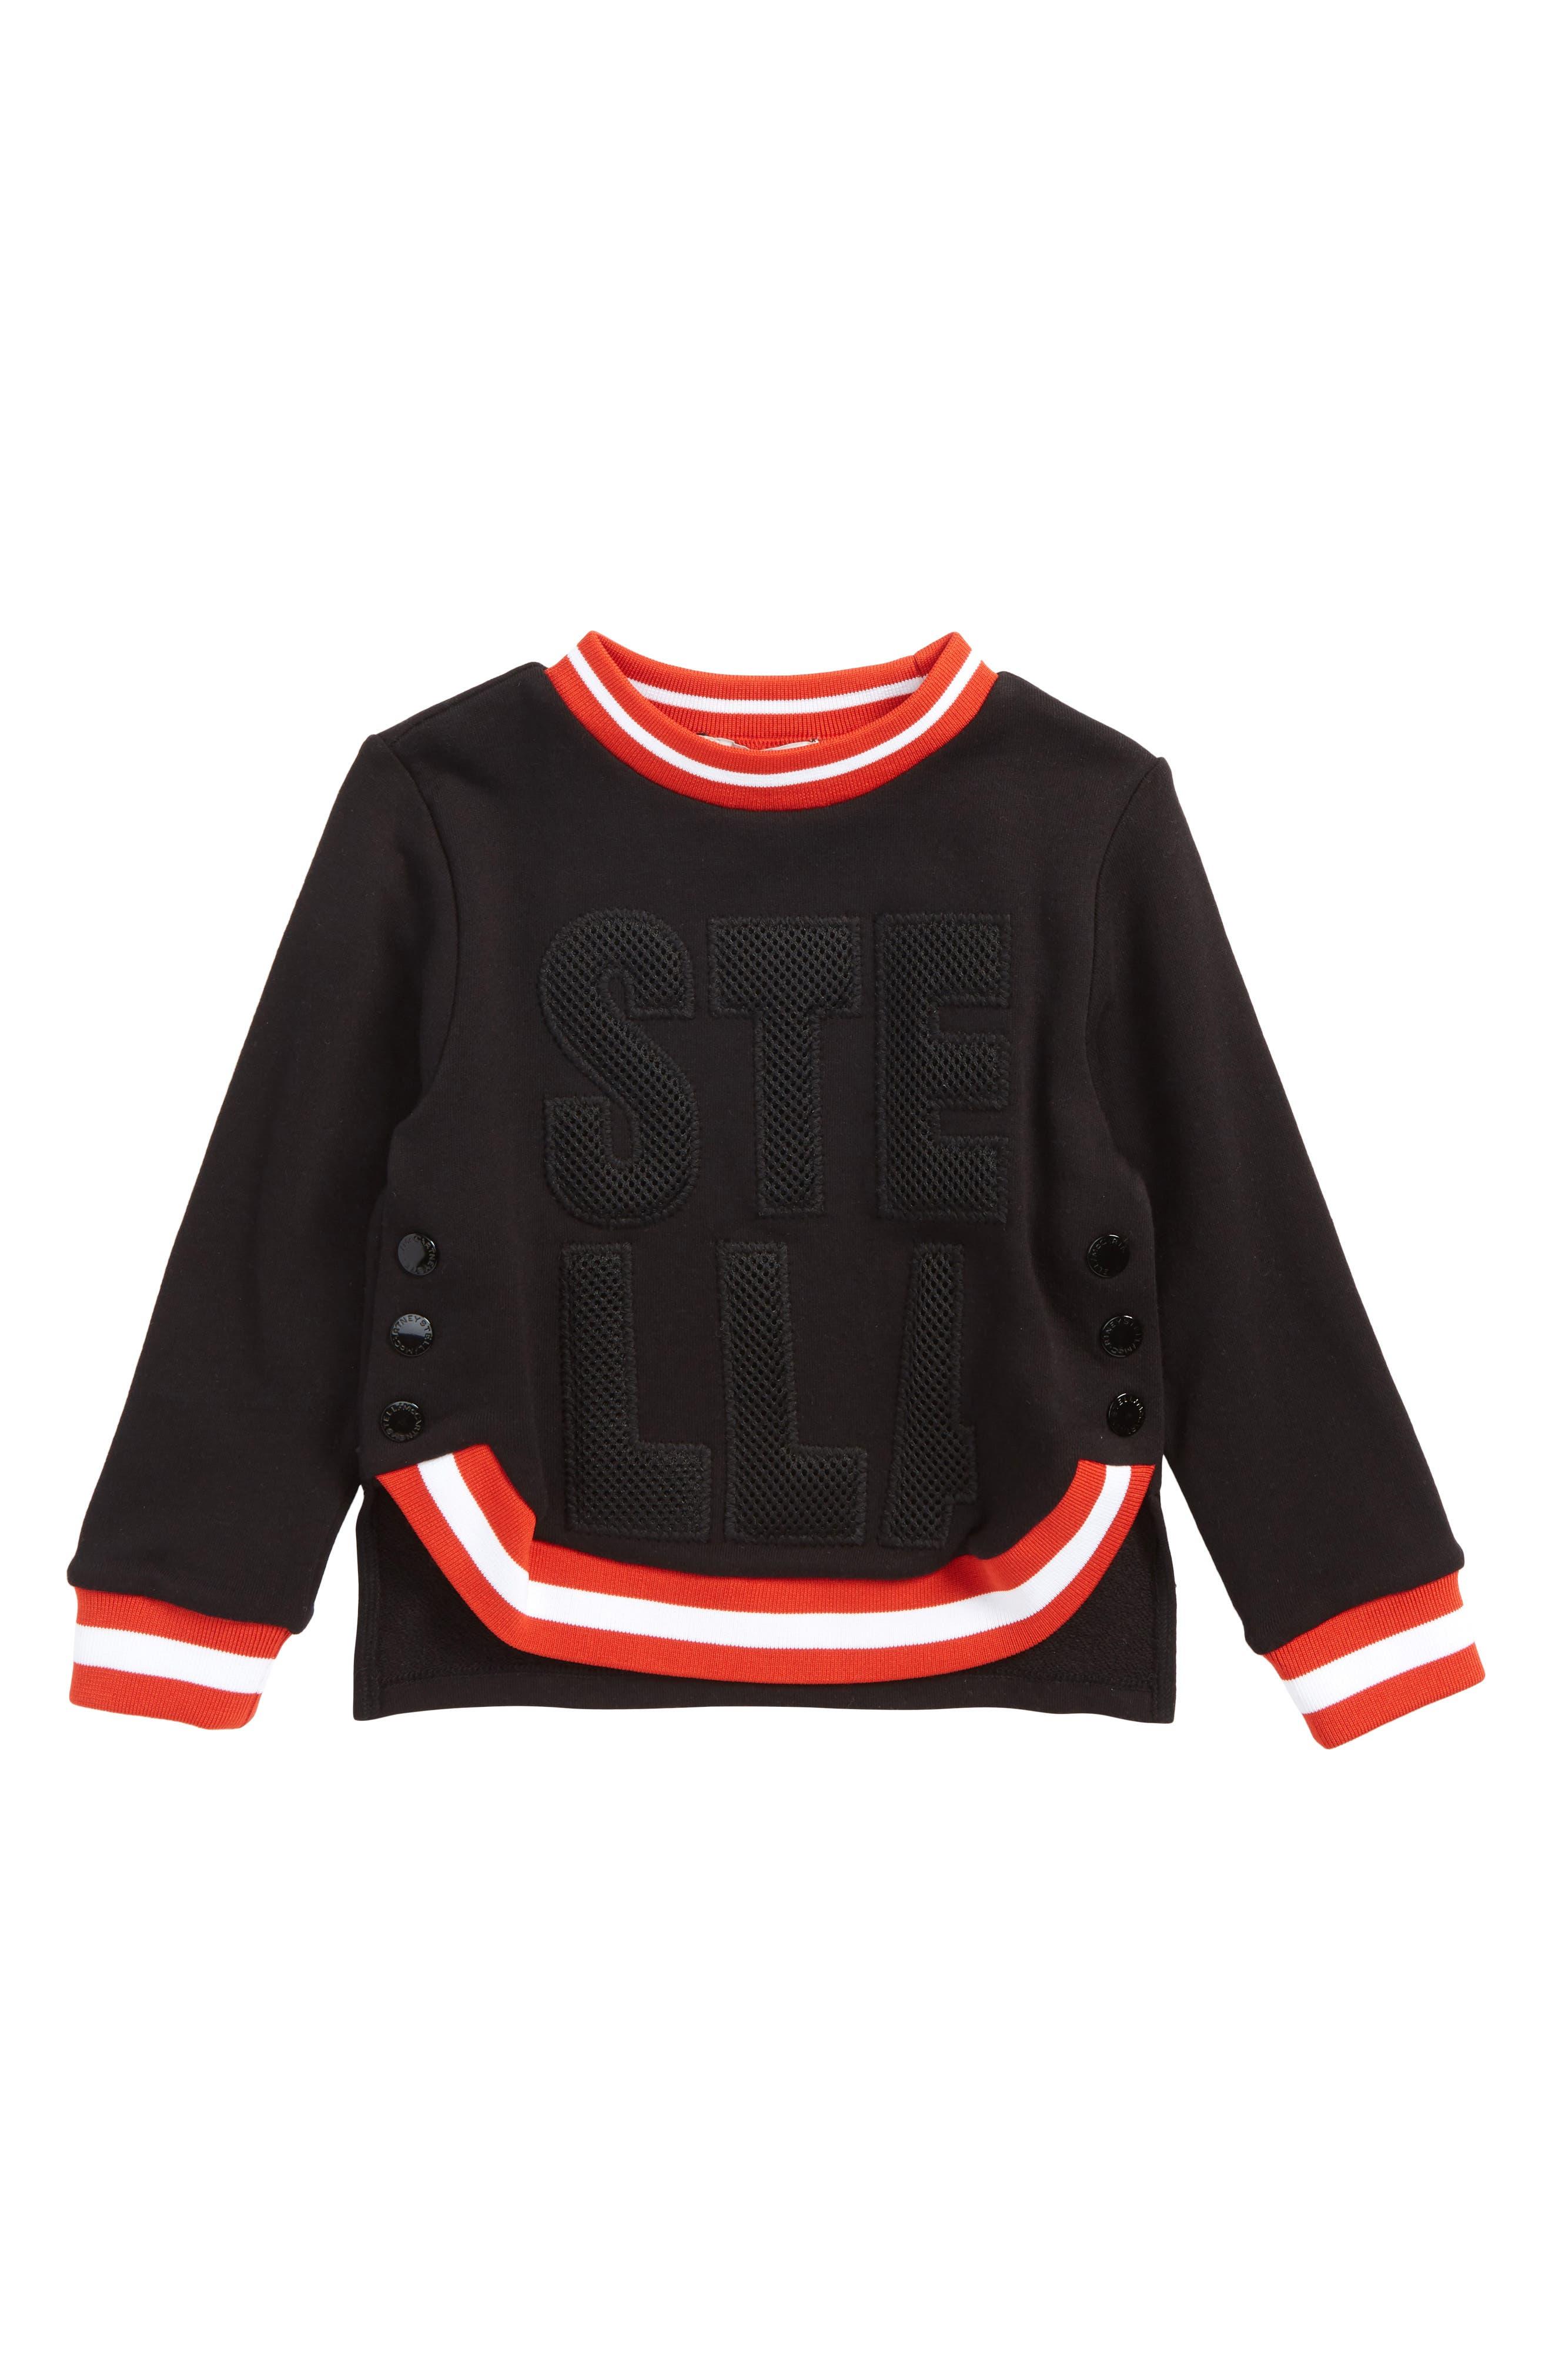 Daya Sweatshirt,                         Main,                         color, Black